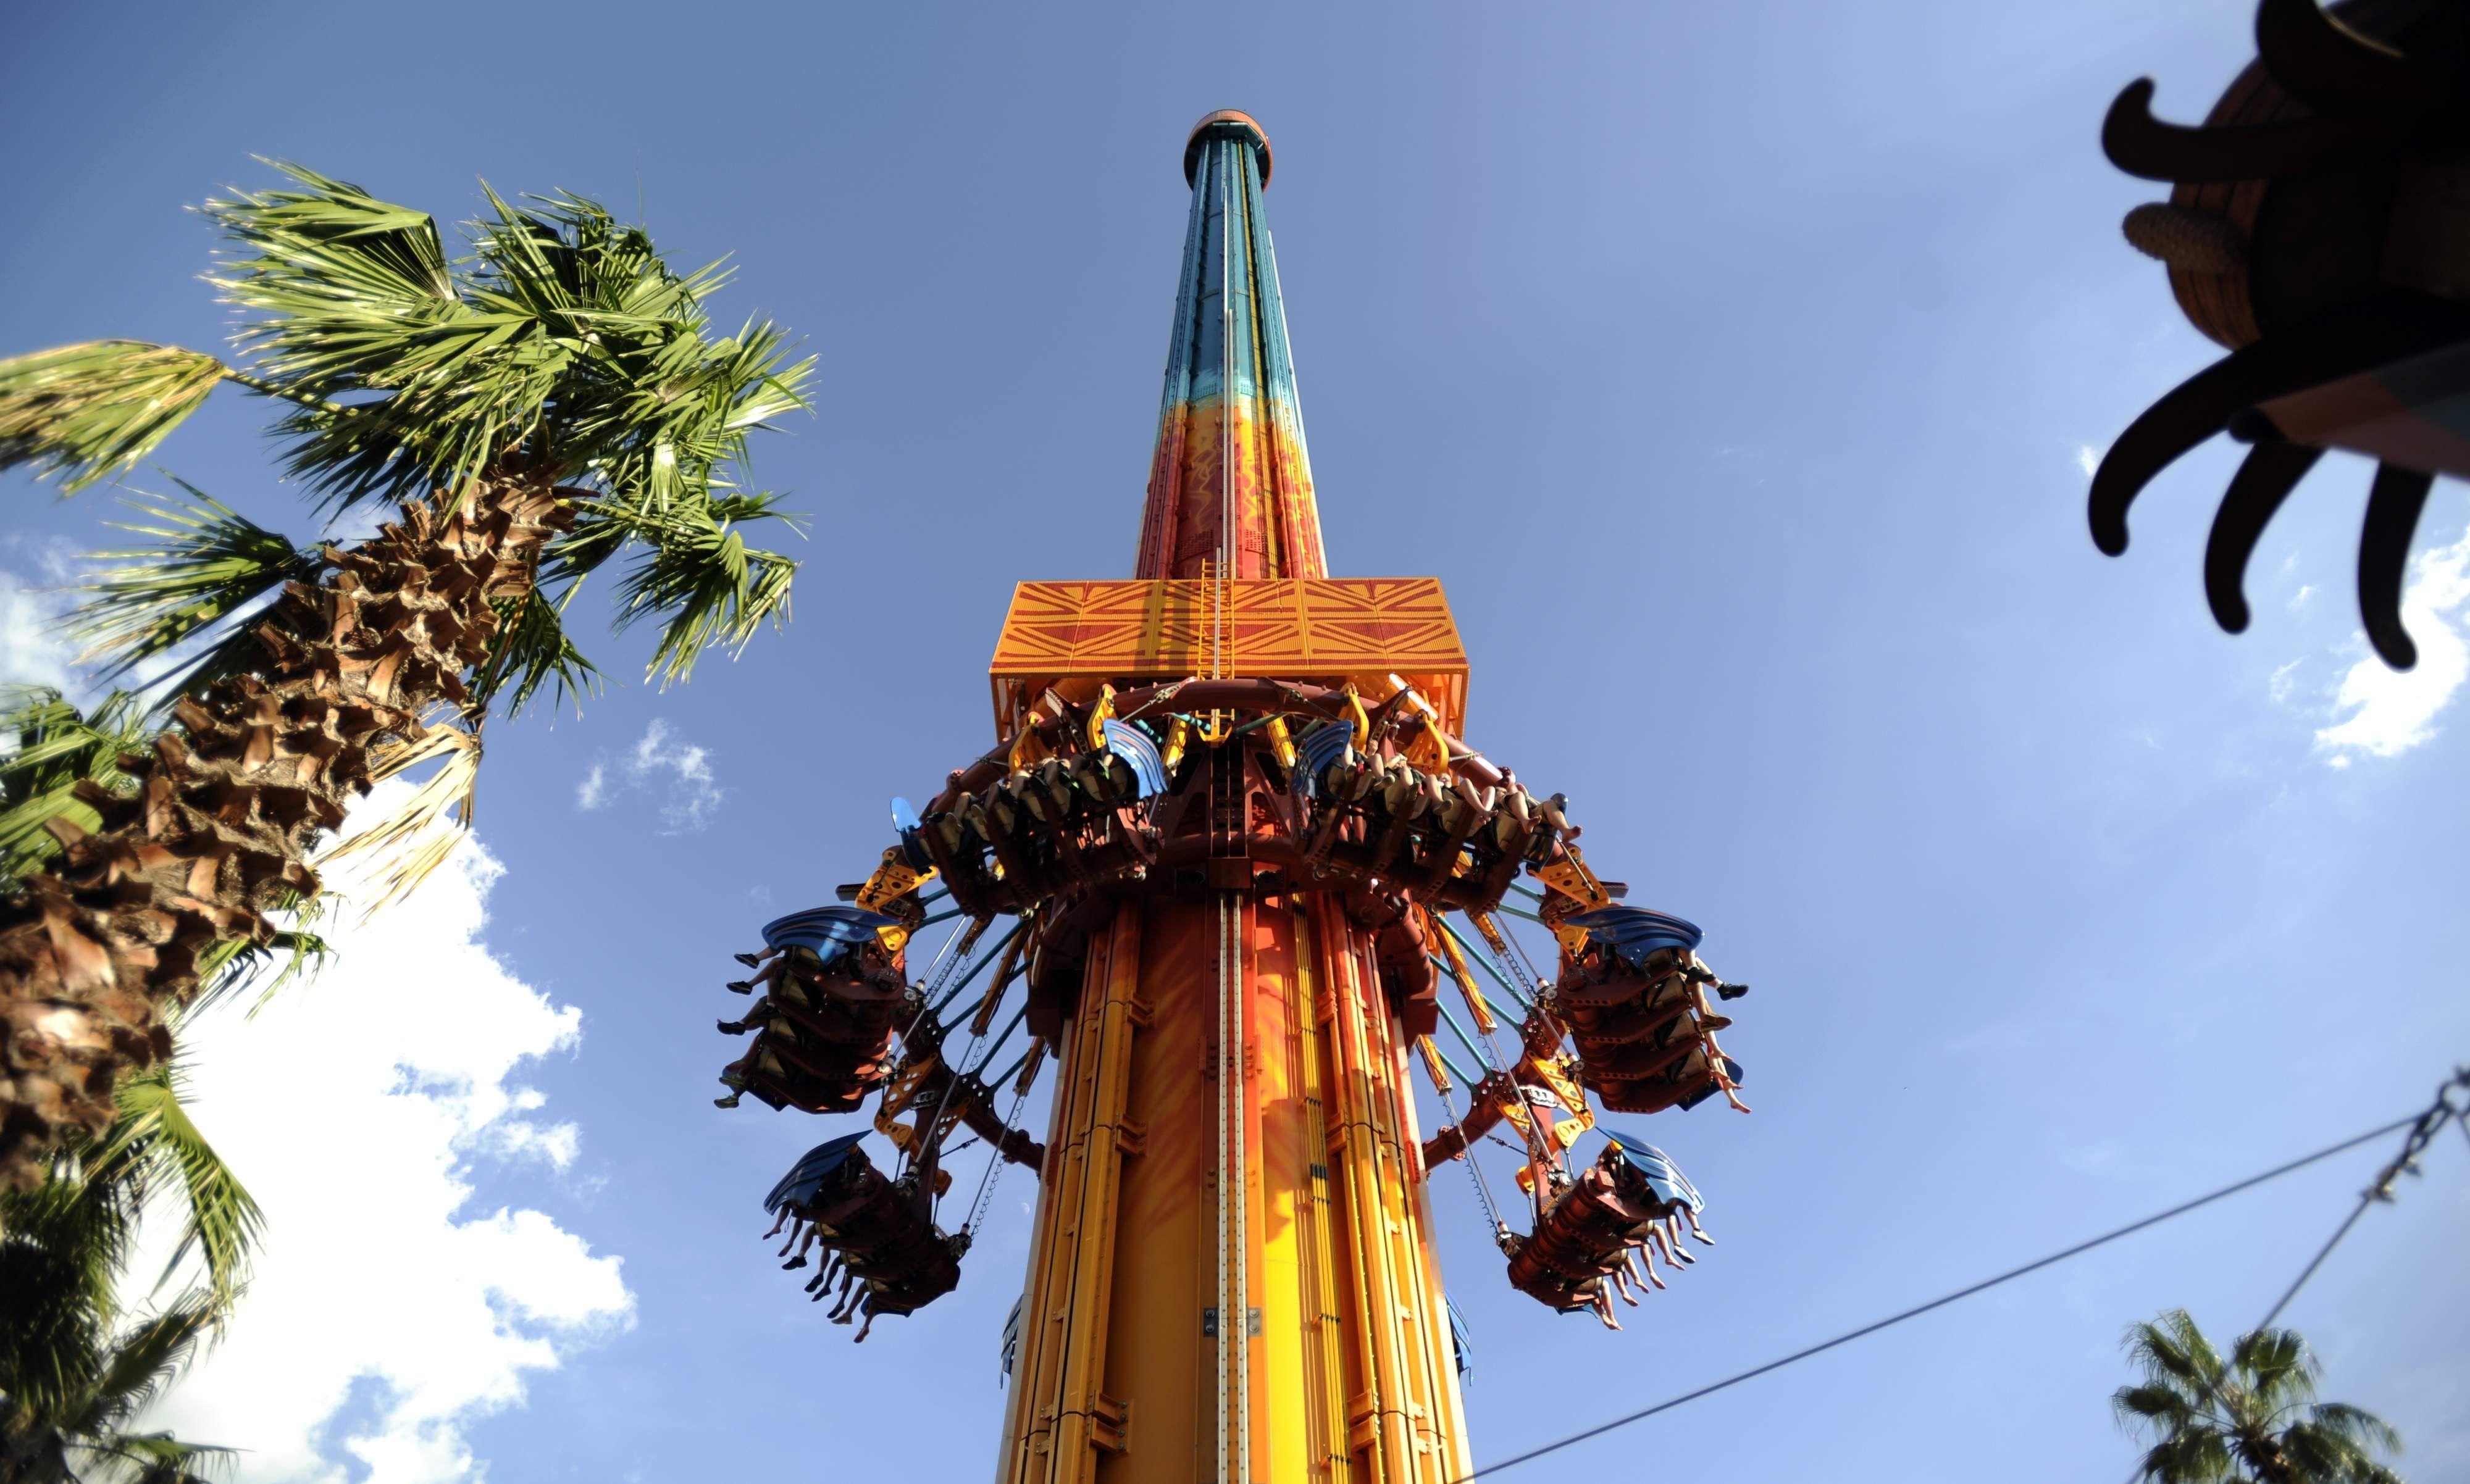 Falcons Fury Busch Gardens Tampa Busch Gardens Tampa